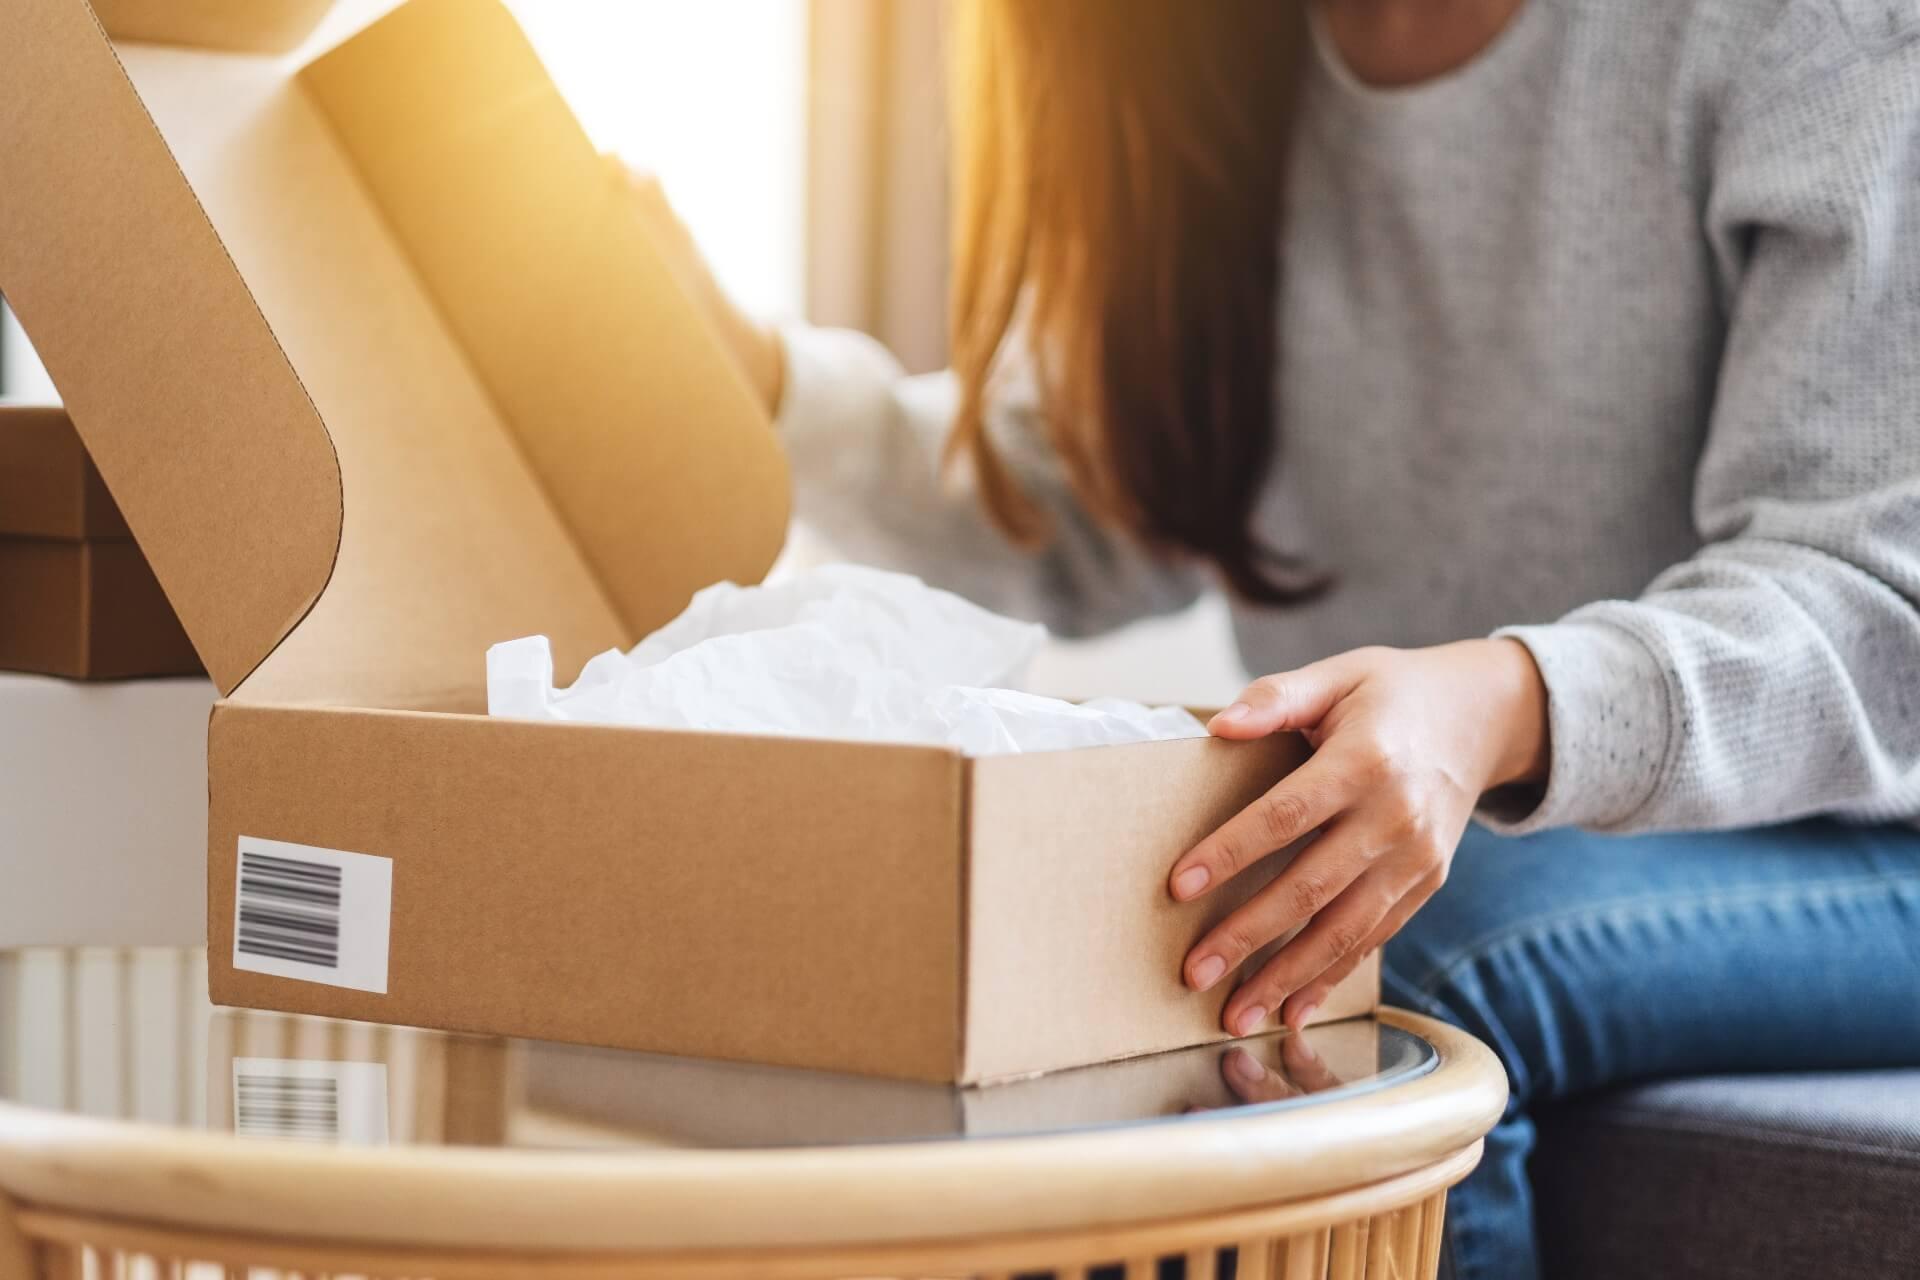 vendendo online: cuidado com as embalagens